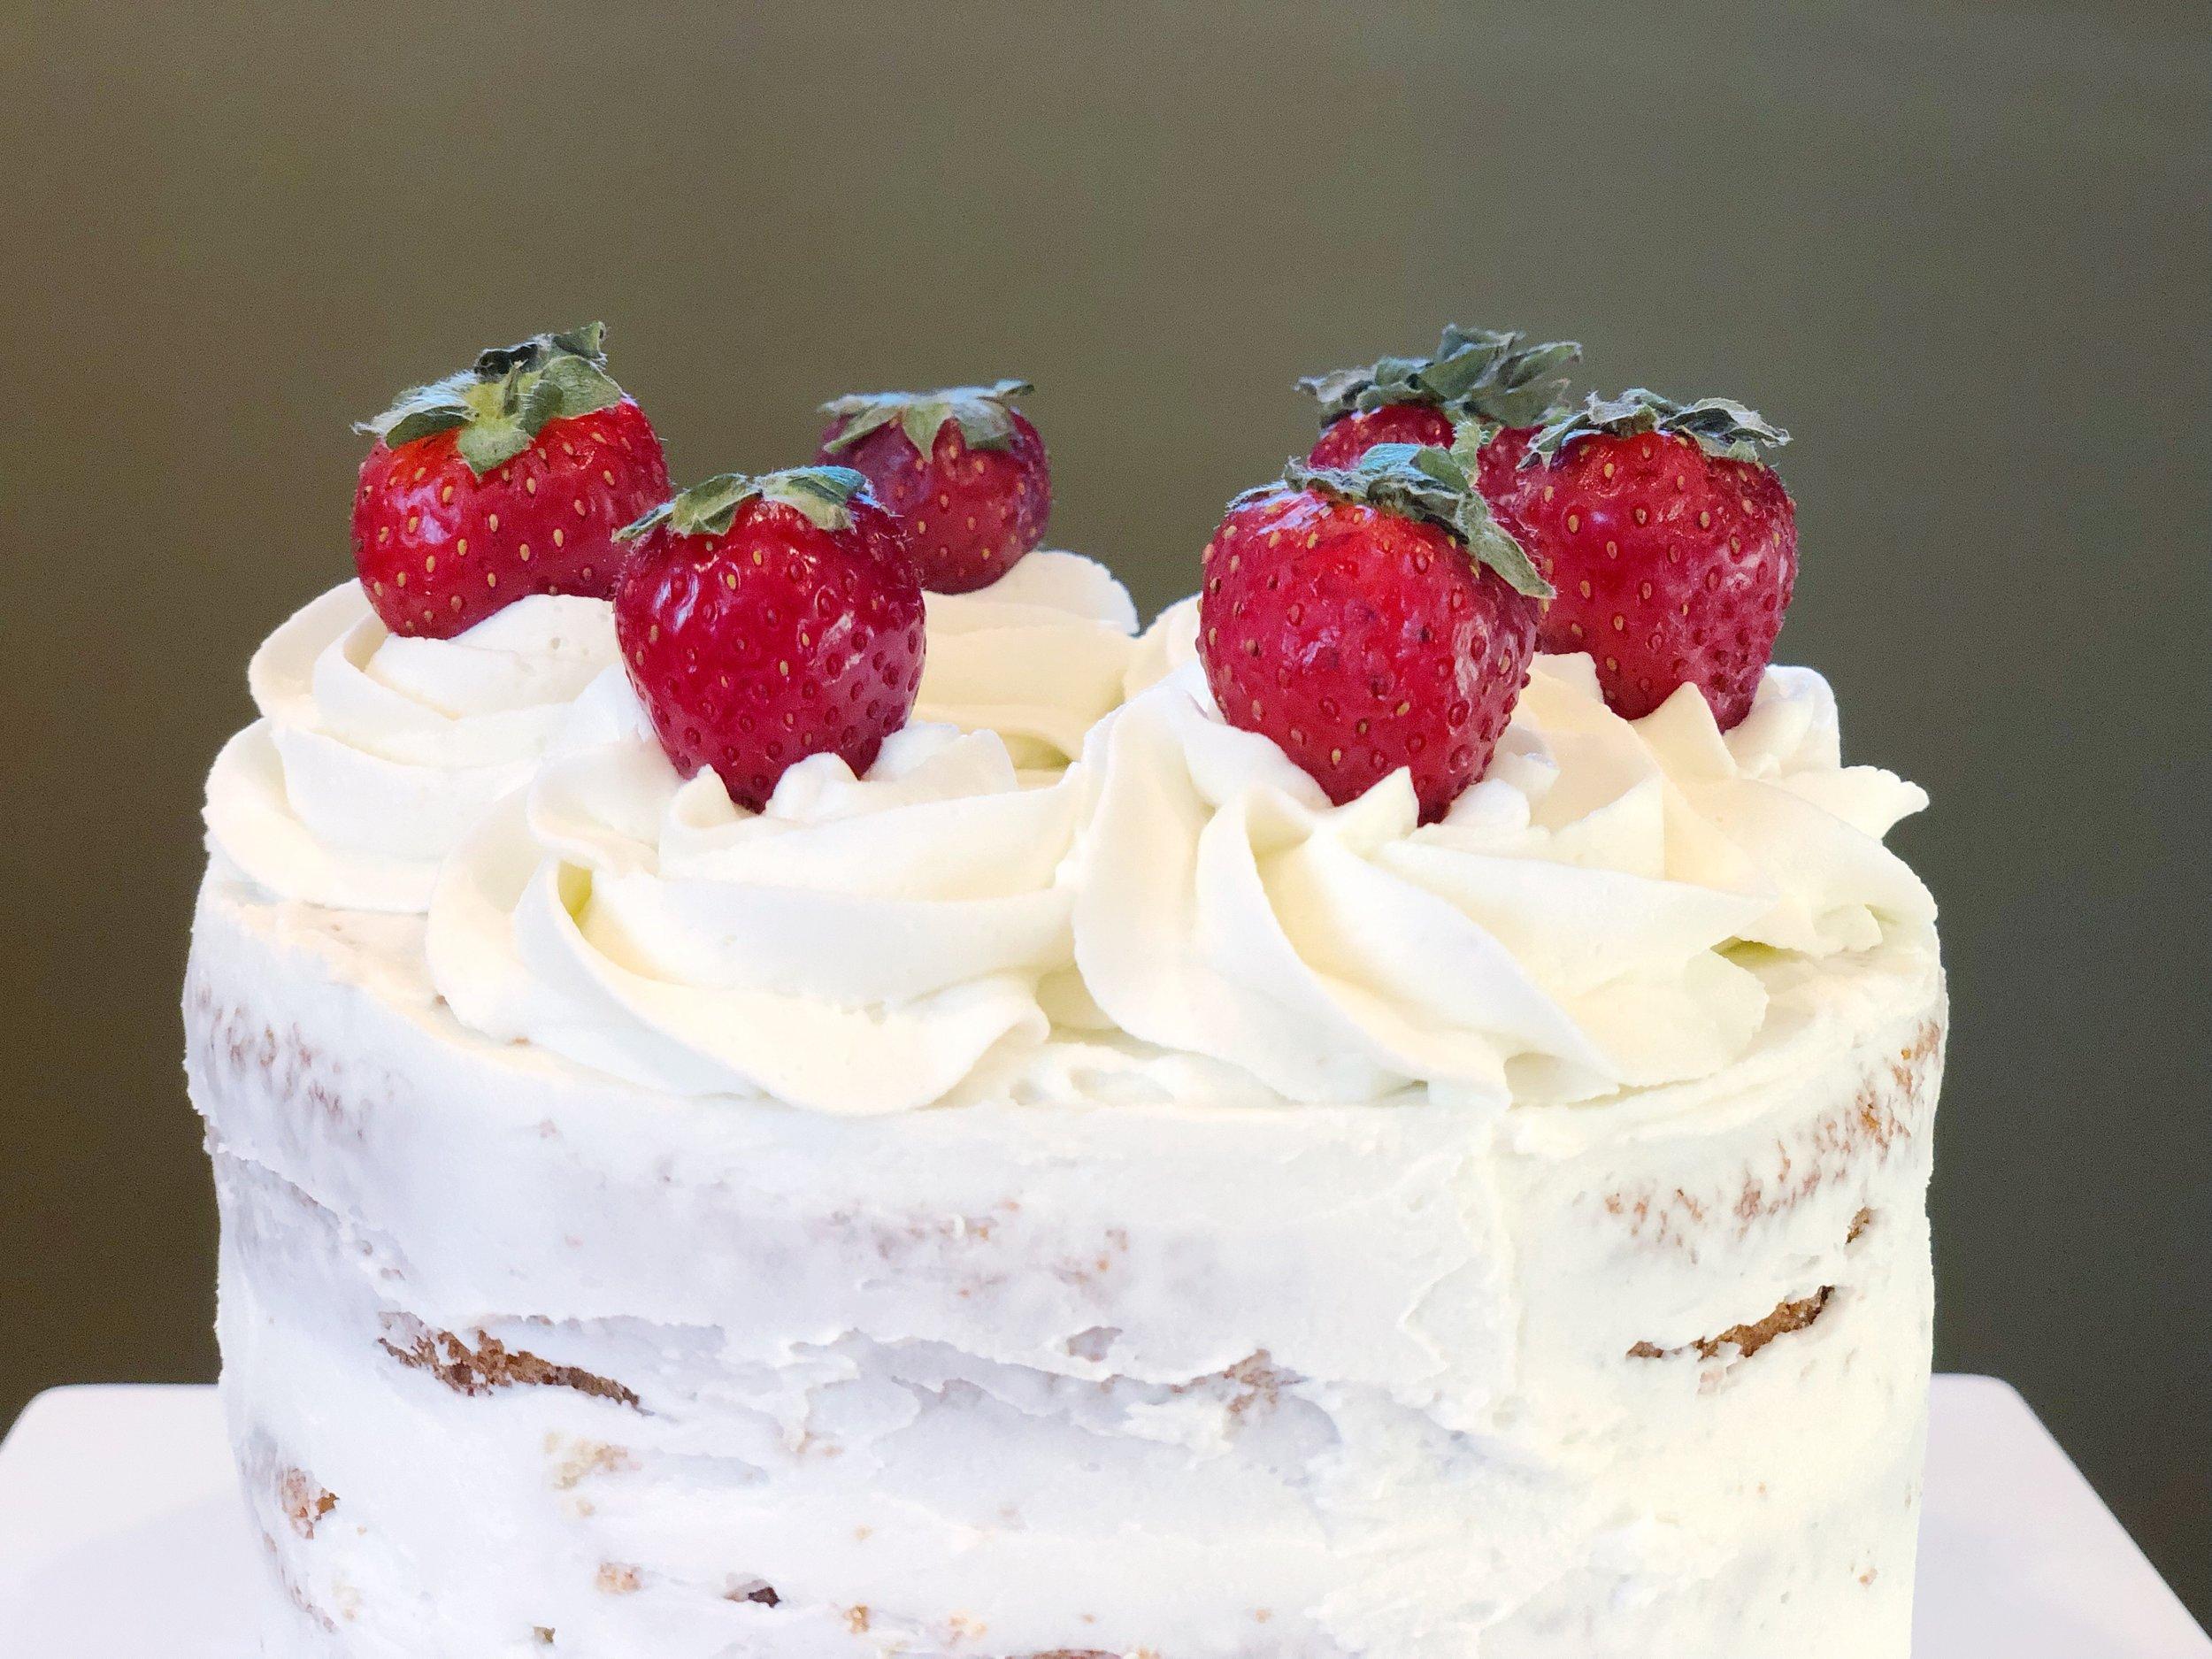 strawberries on my hacked cake mix bakery cake.jpg